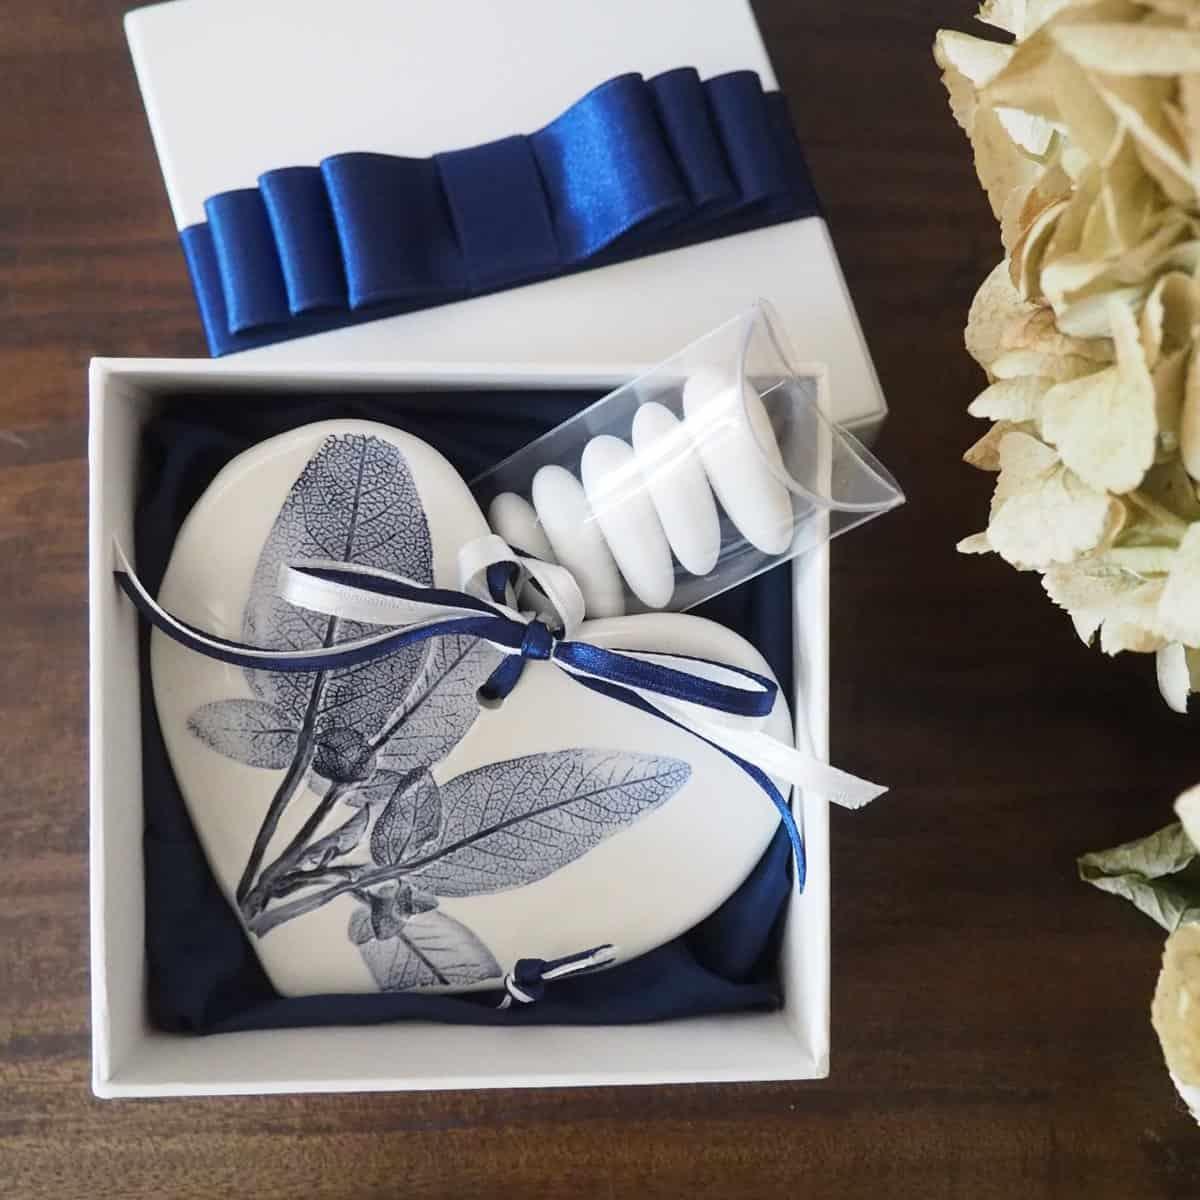 bomboniere cuore ceramica Rimini foglie blu